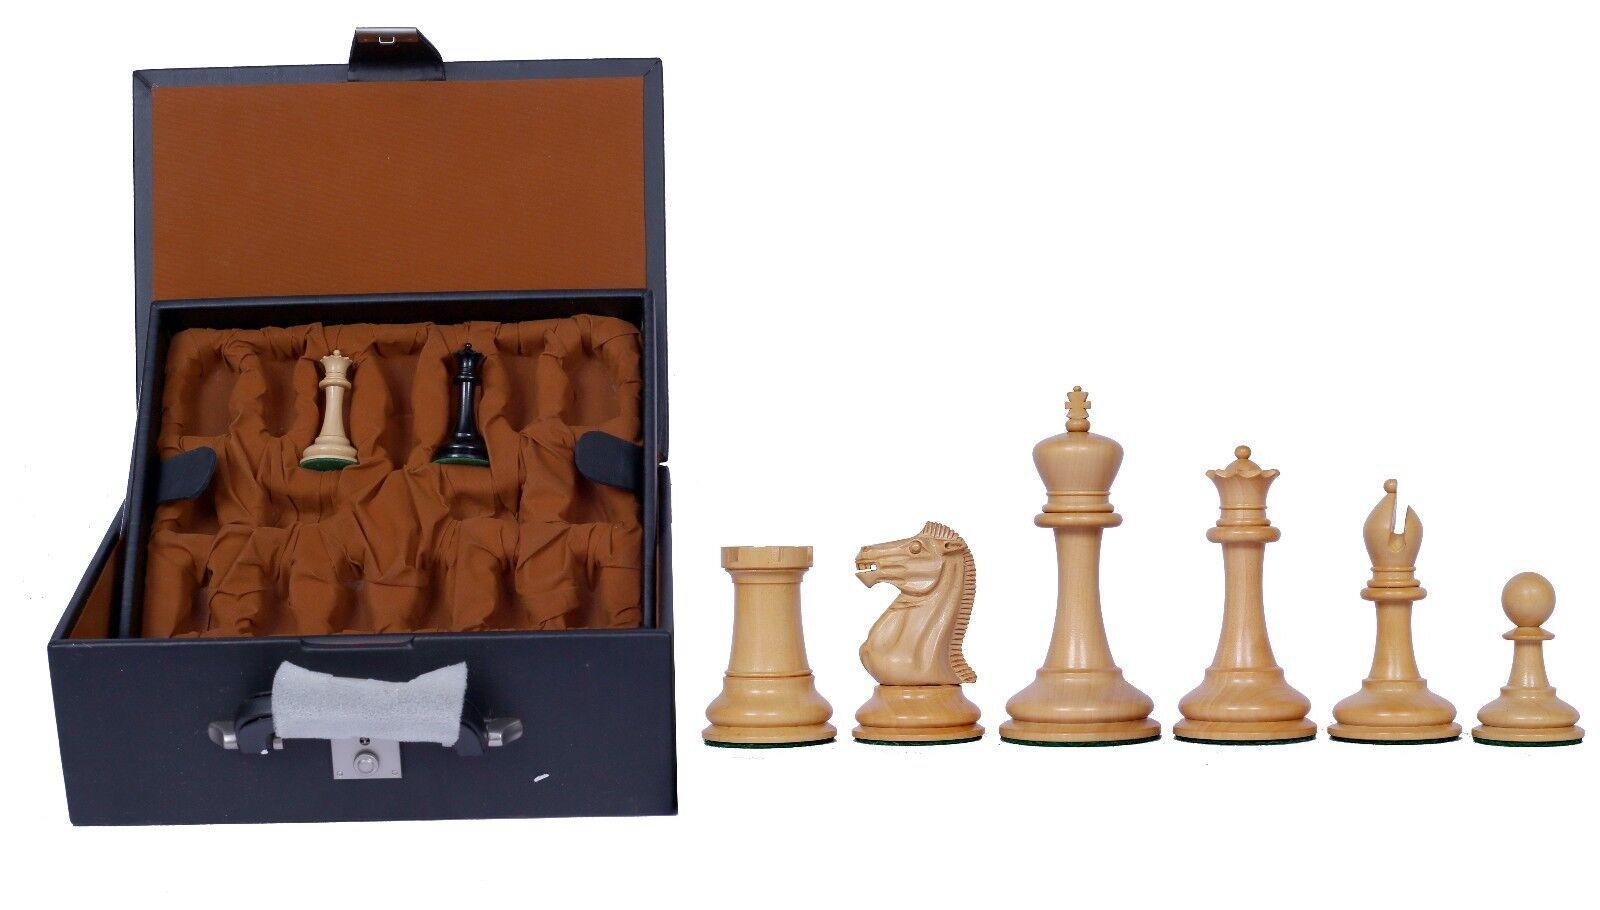 Championship Design Staunton Chessmen 3.5 inch Pure Ebony with Presentation Box